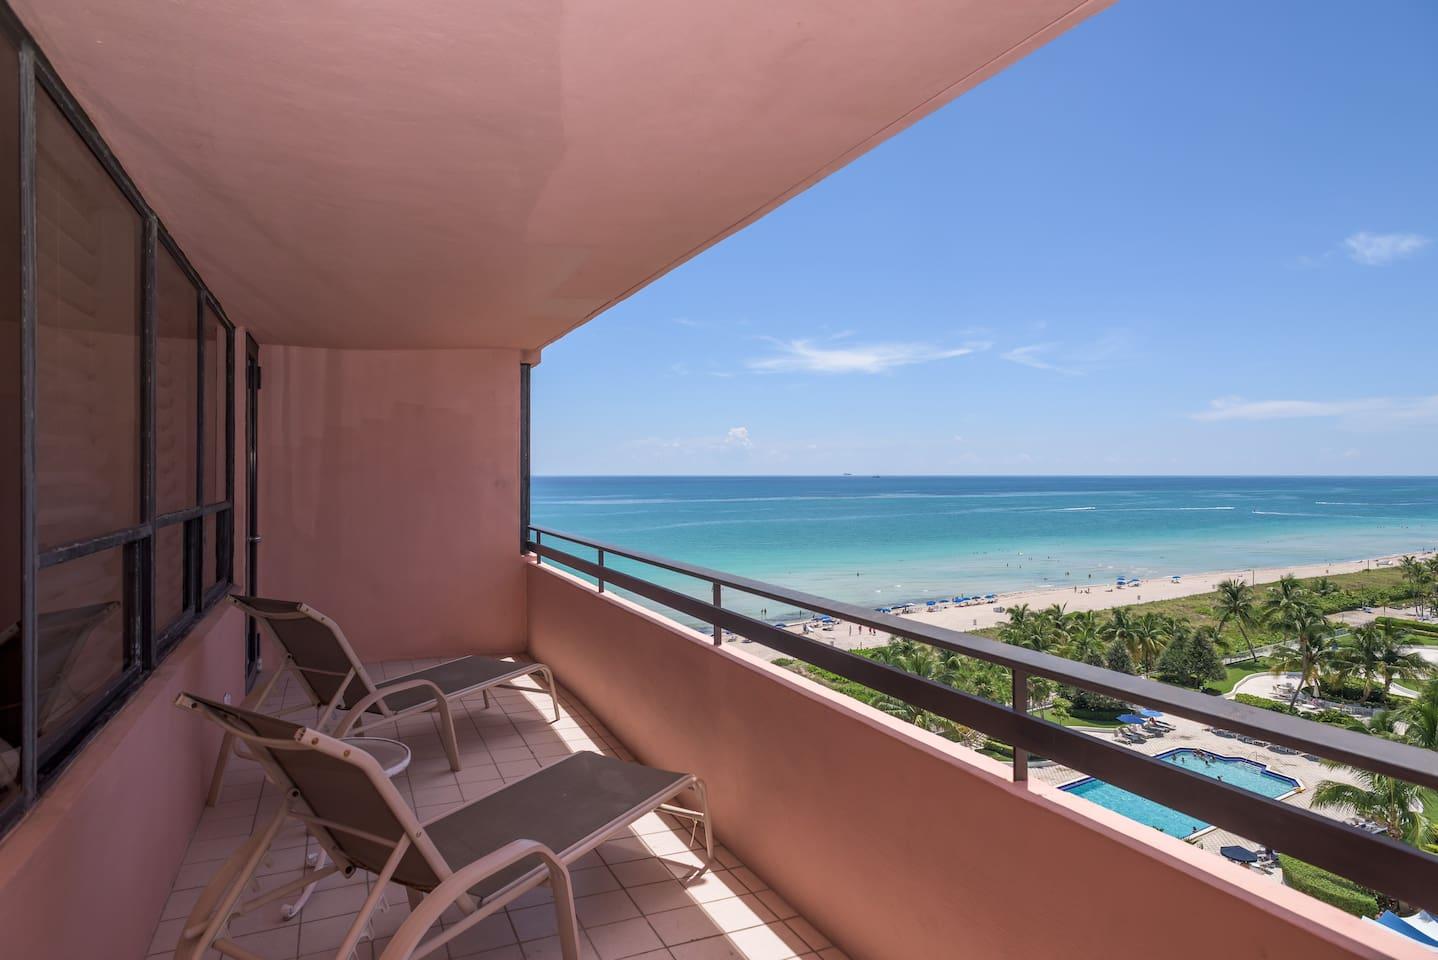 1203 Amazing Hotel-Apt on the Beach